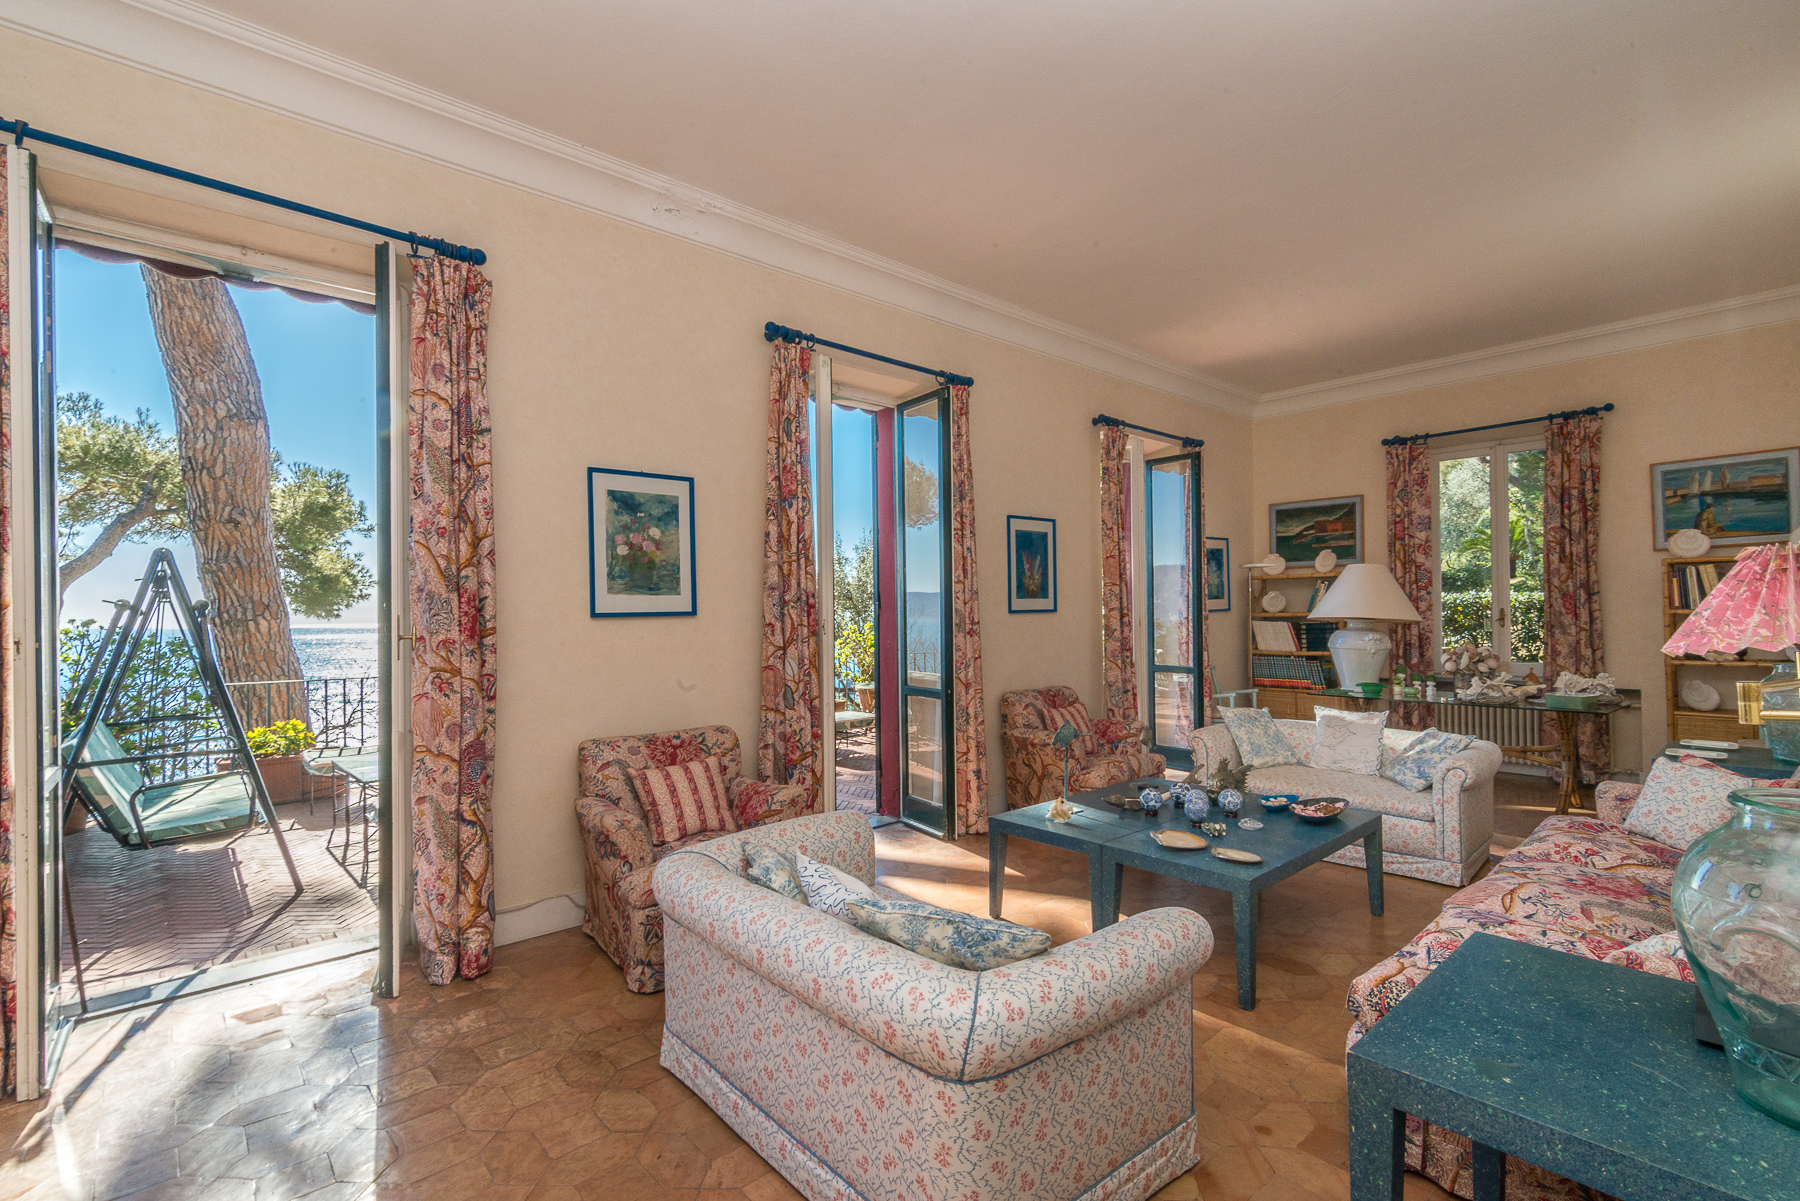 Villa in Vendita a Santa Margherita Ligure: 5 locali, 440 mq - Foto 12